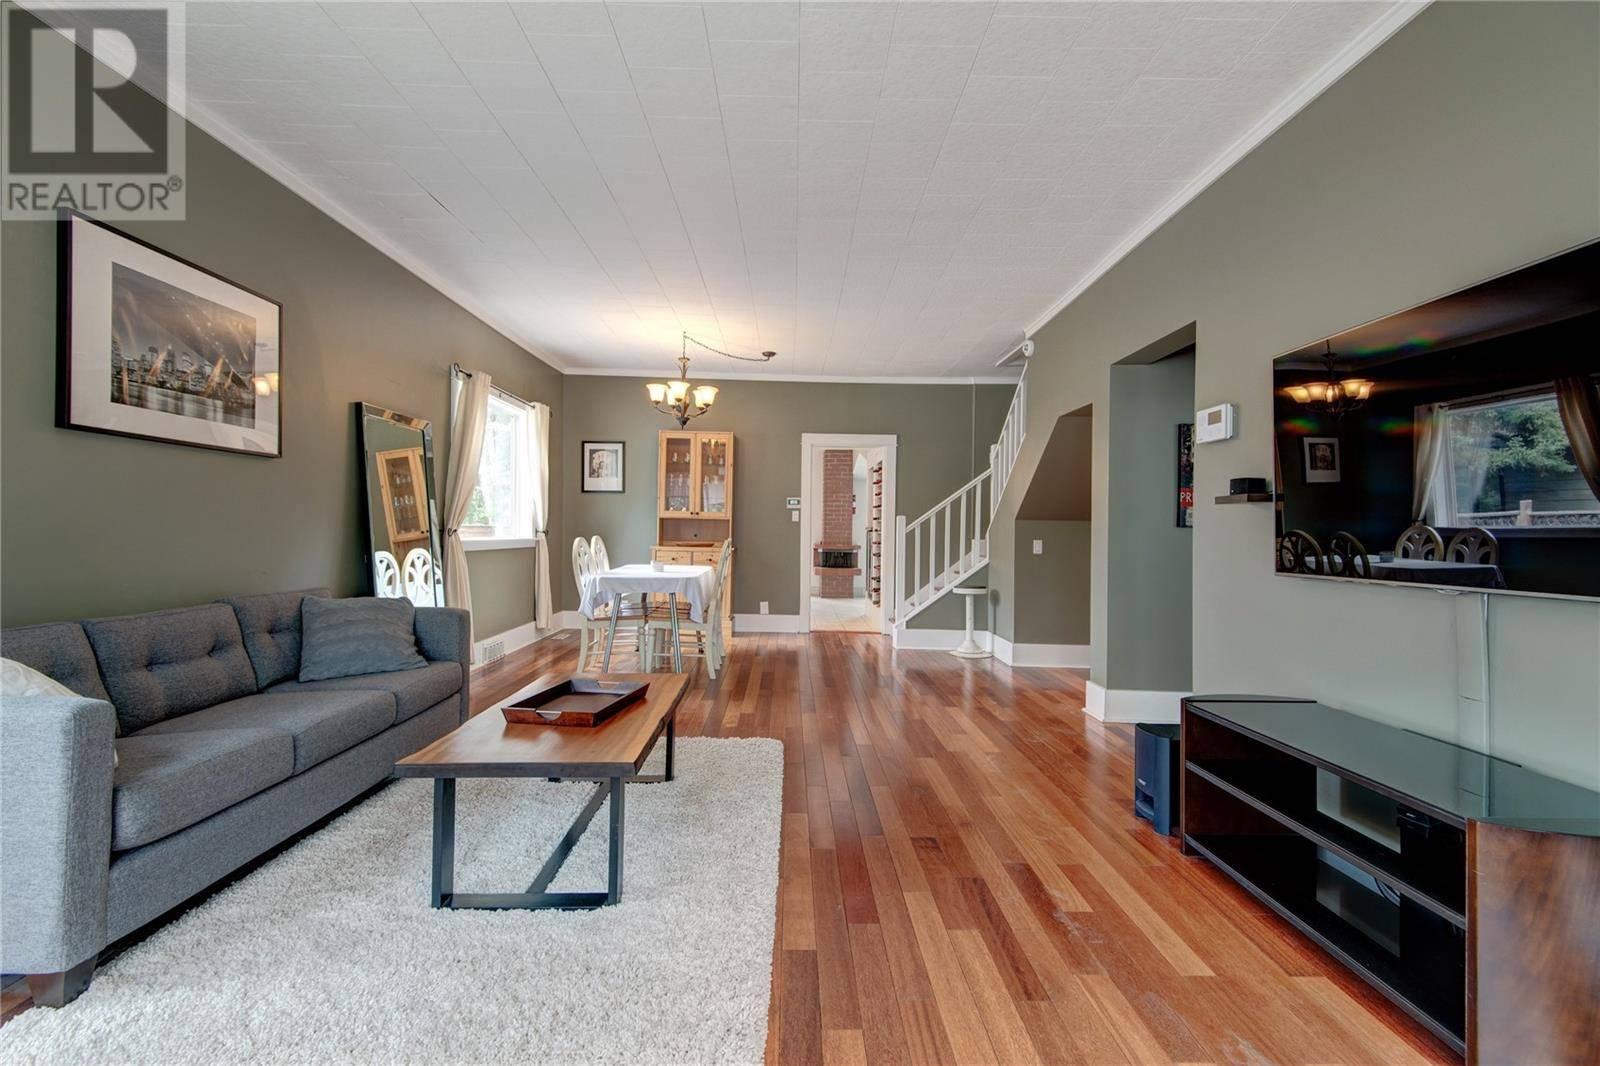 House for sale at 112 112th St W Saskatoon Saskatchewan - MLS: SK782769